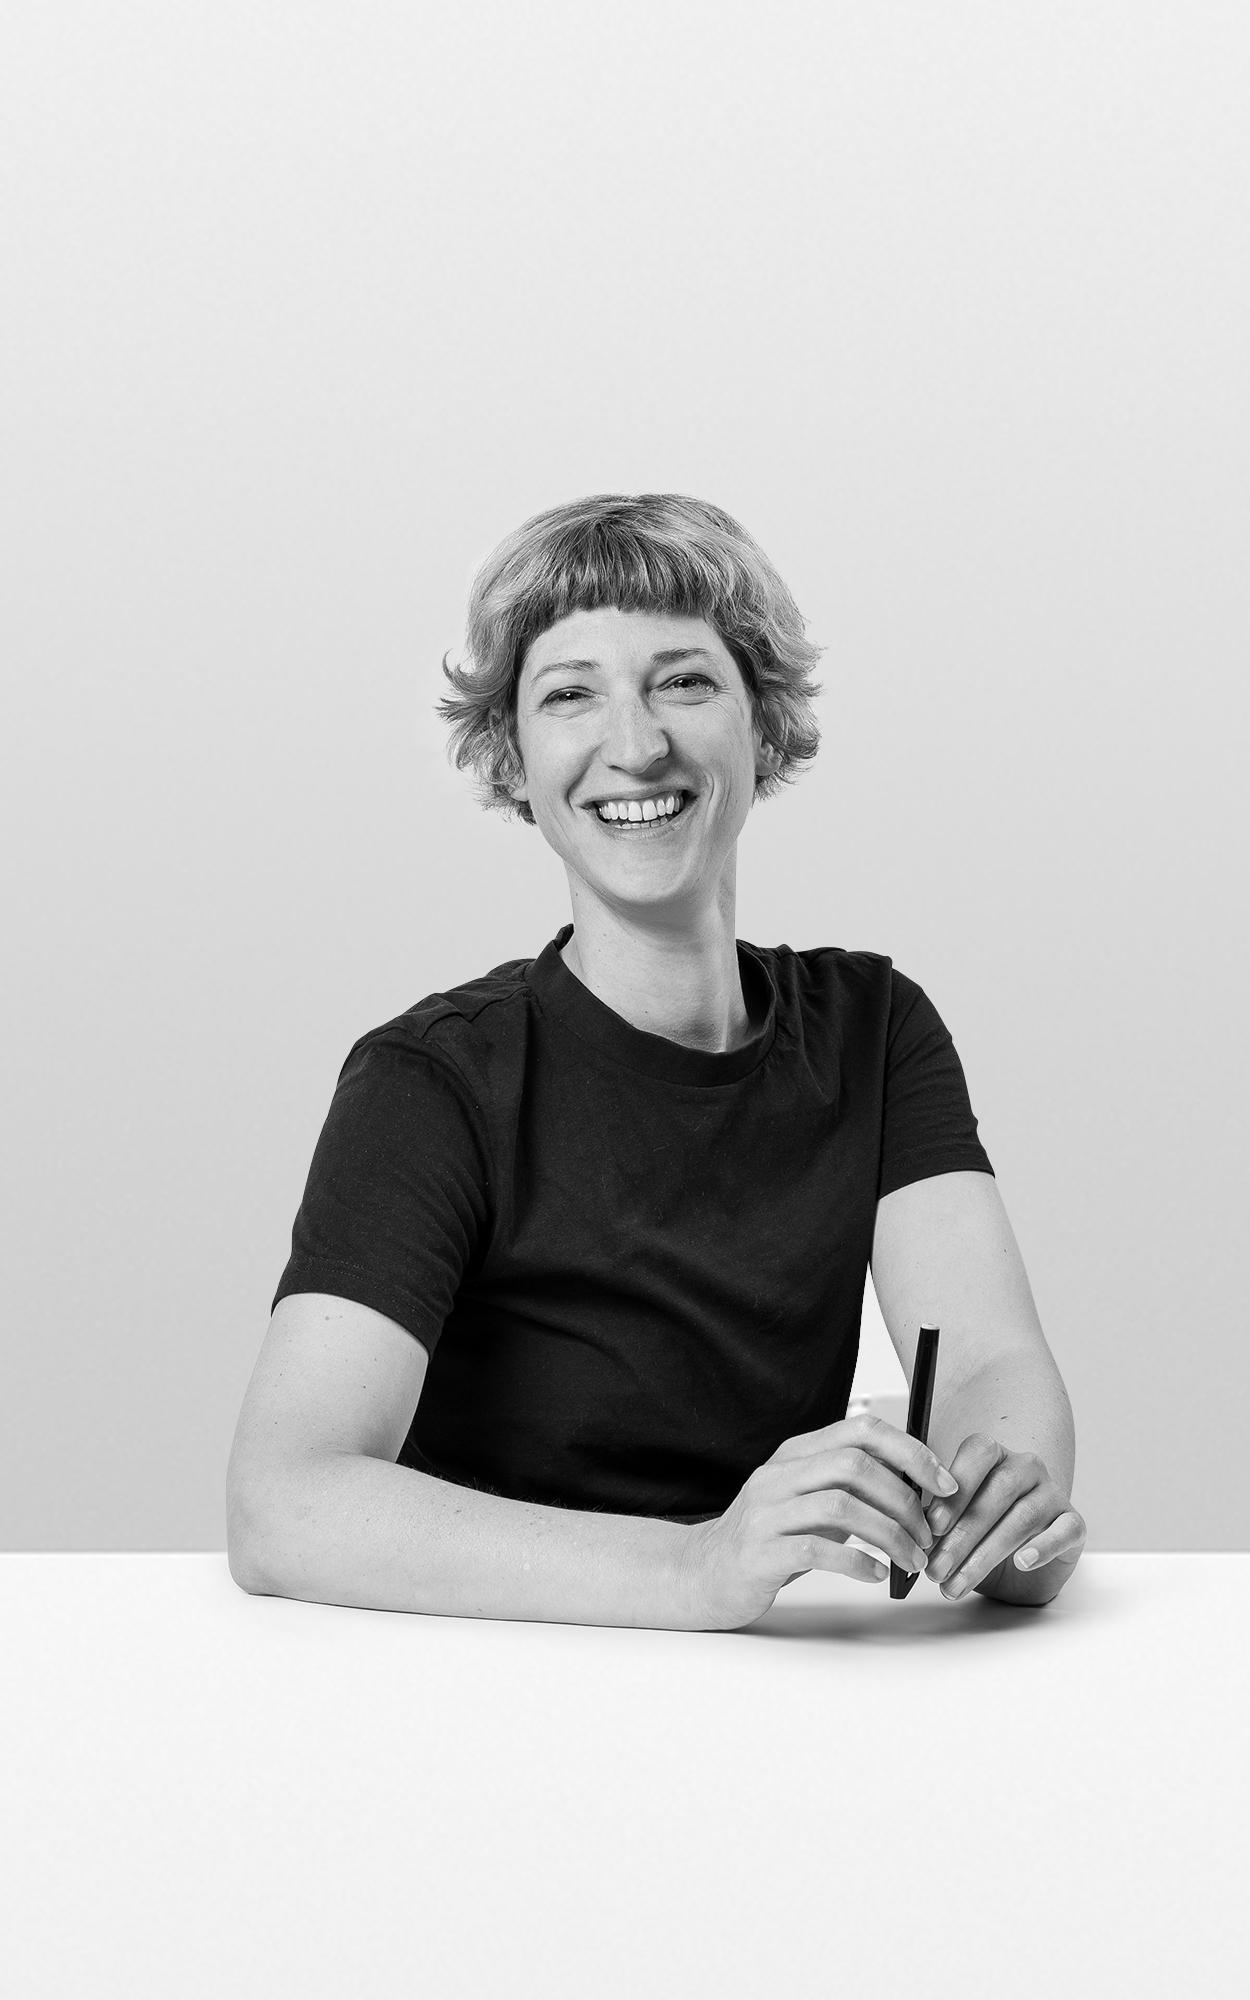 Katja-Lisette Seger